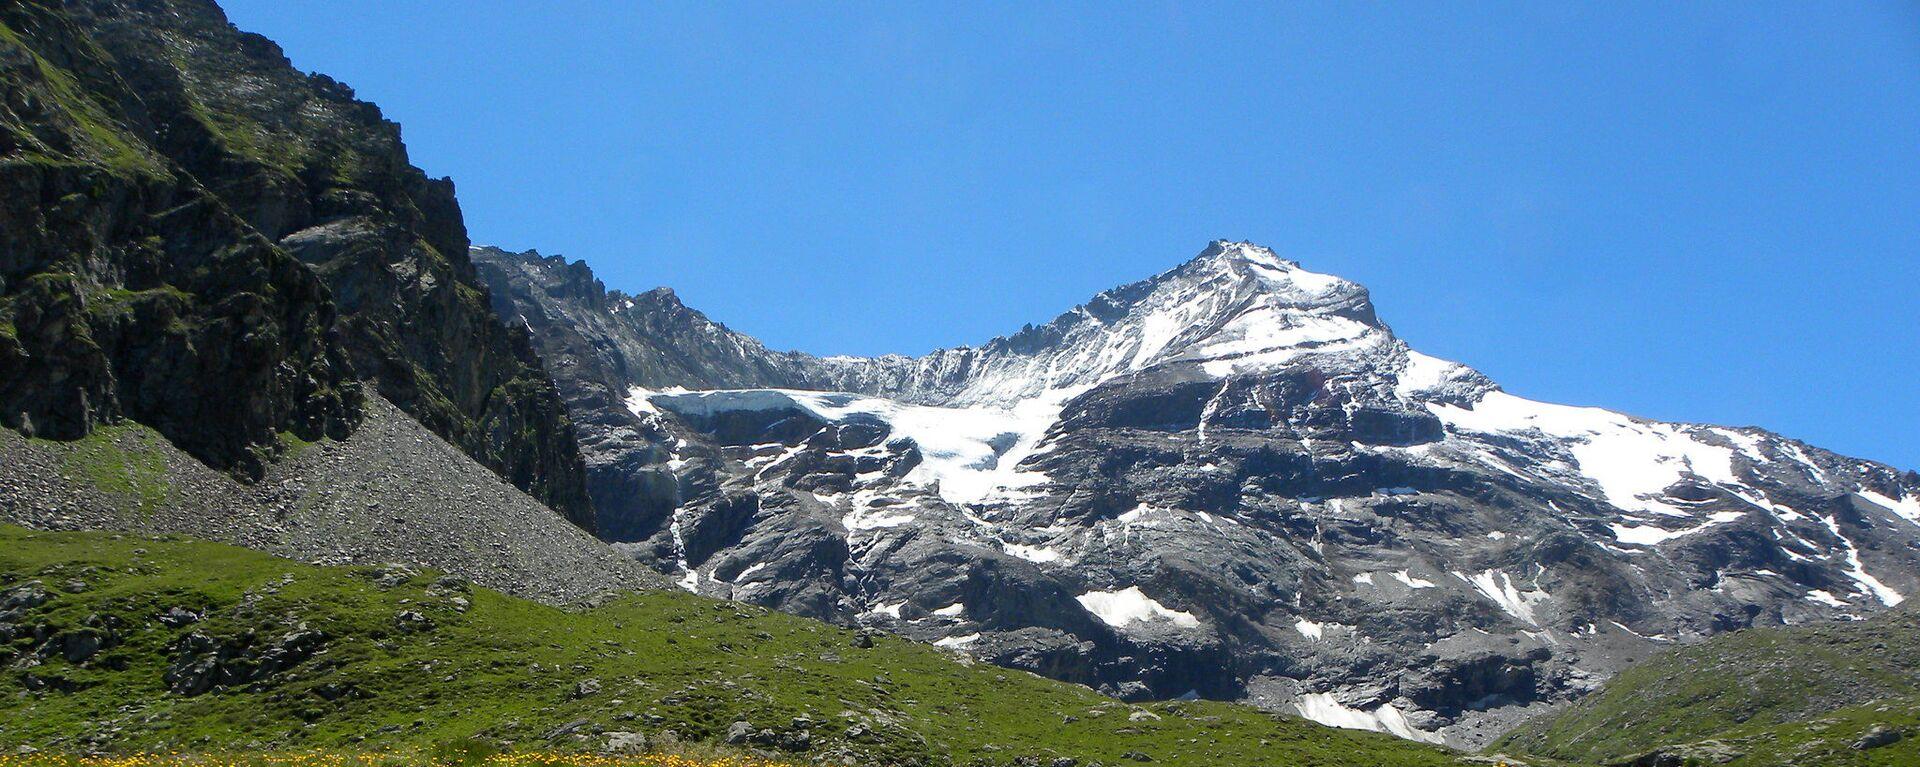 Parco Nazionale del Gran Paradiso (PNGP) - Alpi Graie. - Sputnik Italia, 1920, 24.08.2021